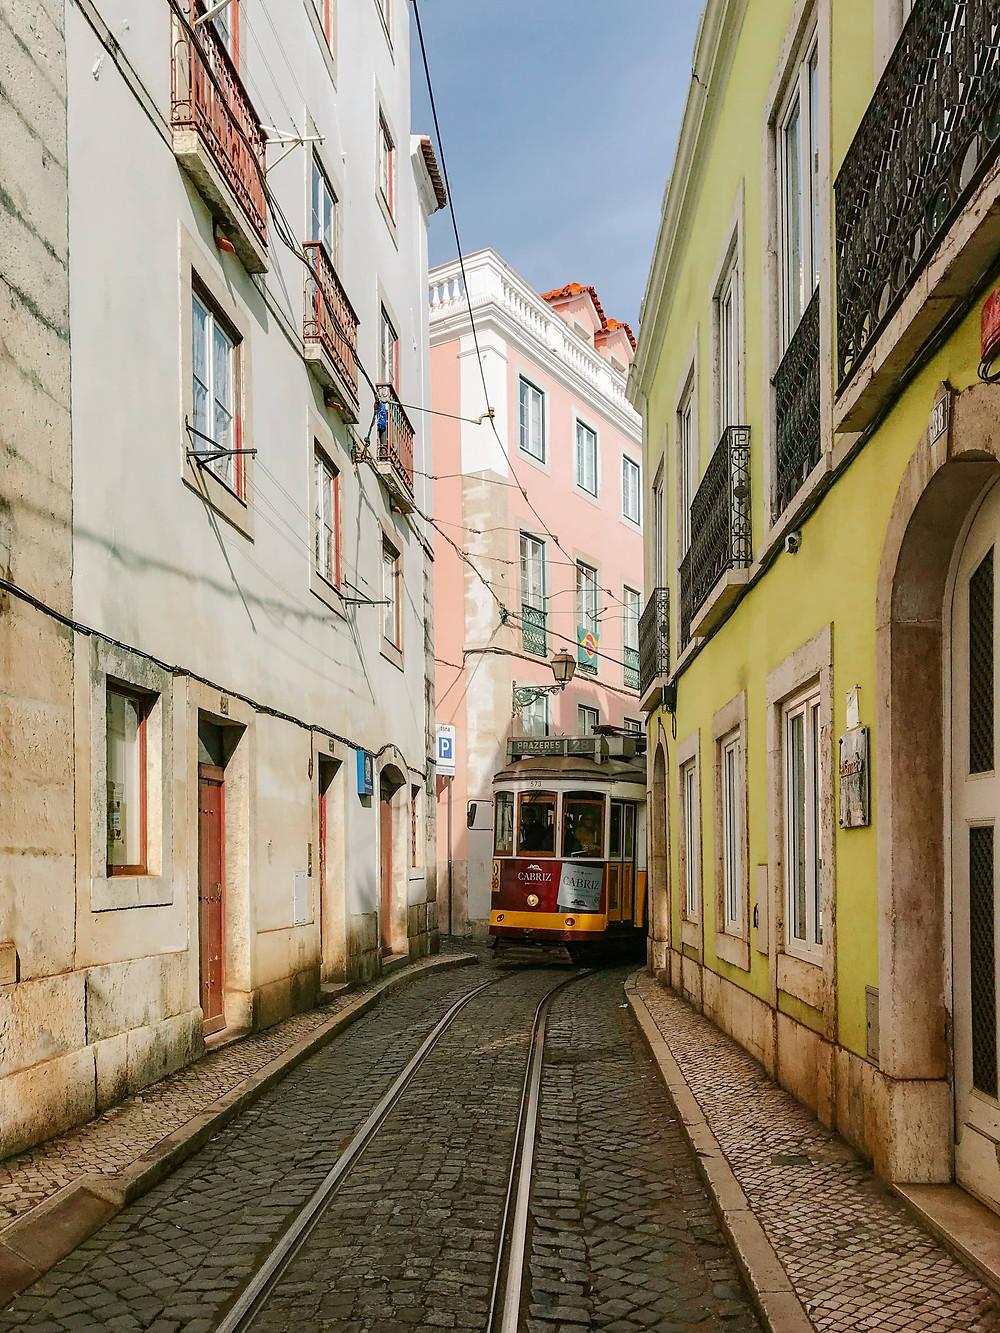 lisbon tram coming through narrow streets cobblestone streets